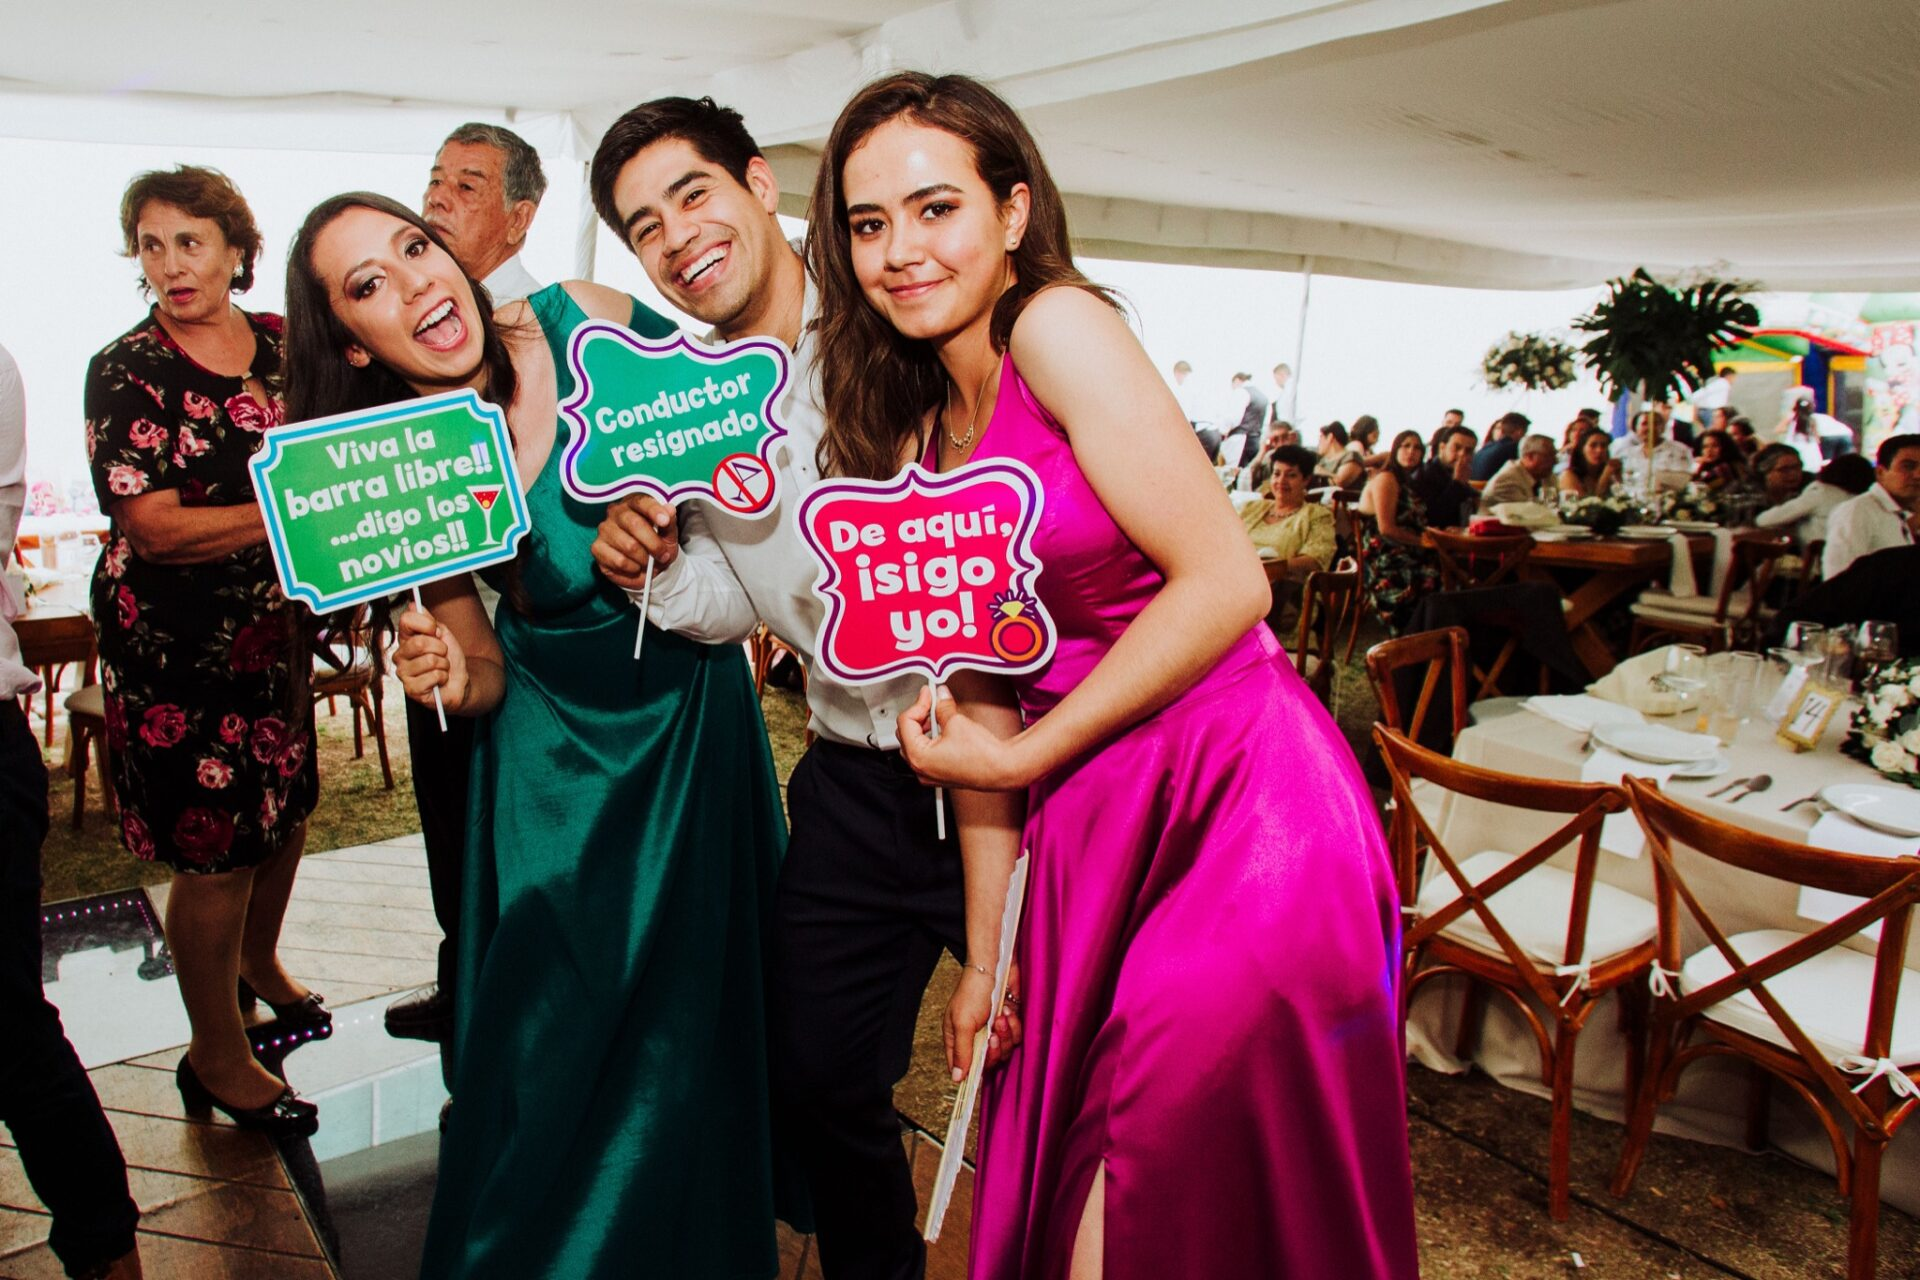 javier_noriega_fotografo_bodas_centro_platero_zacatecas_wedding_photographer34